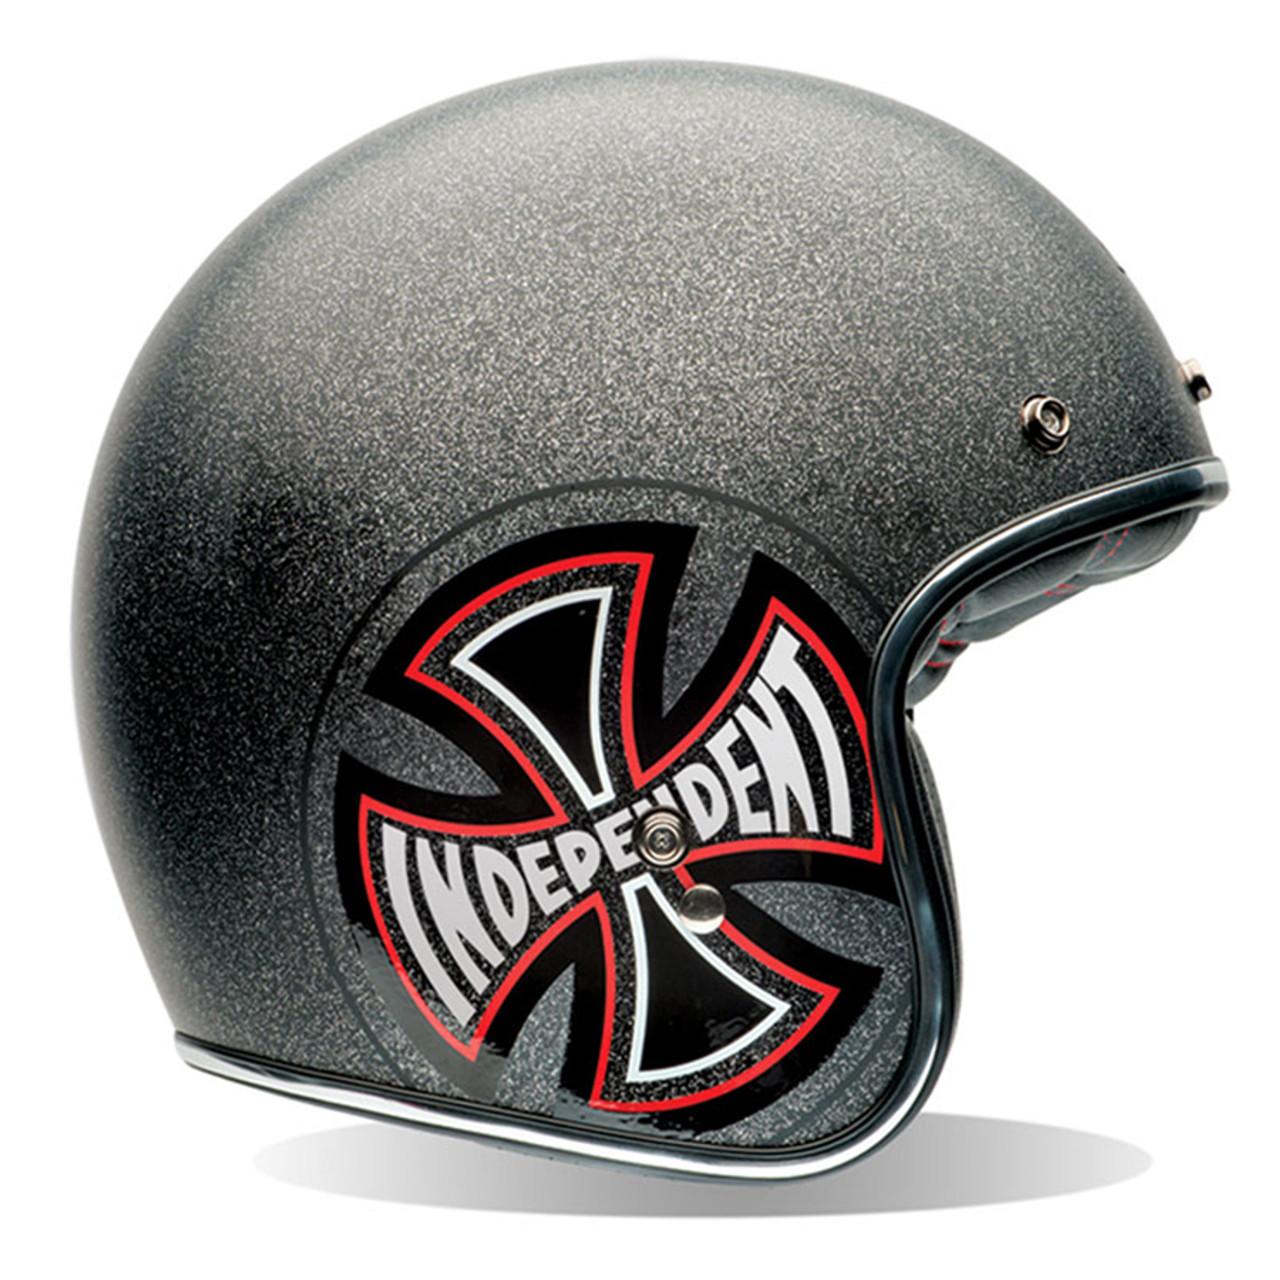 Bell Custom 500 Independent Helmet